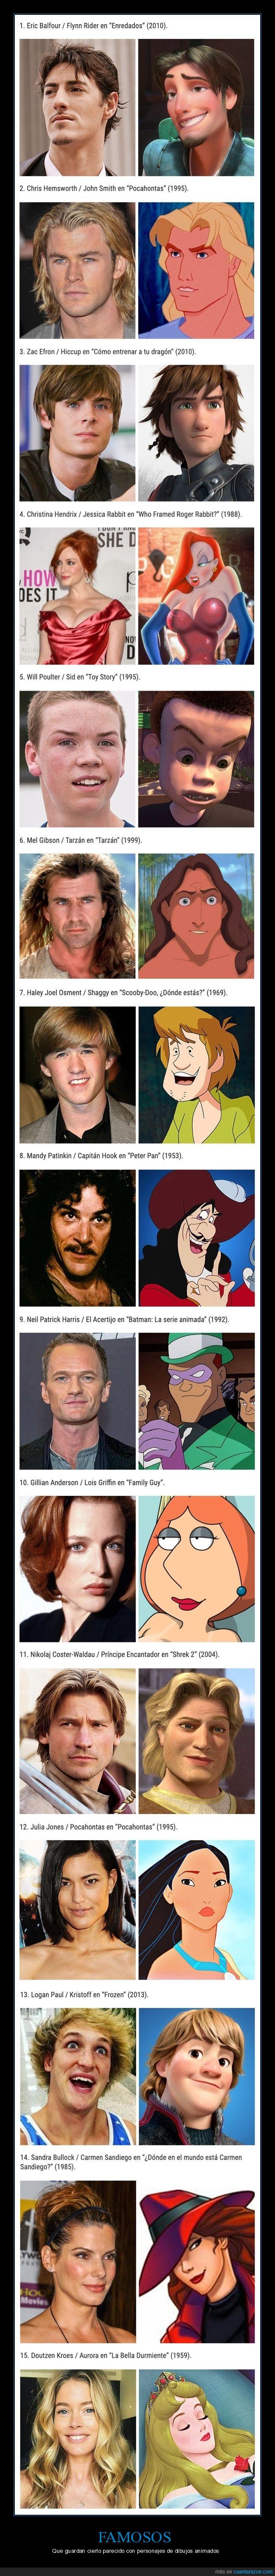 dibujos animados,famosos,parecidos,personajes